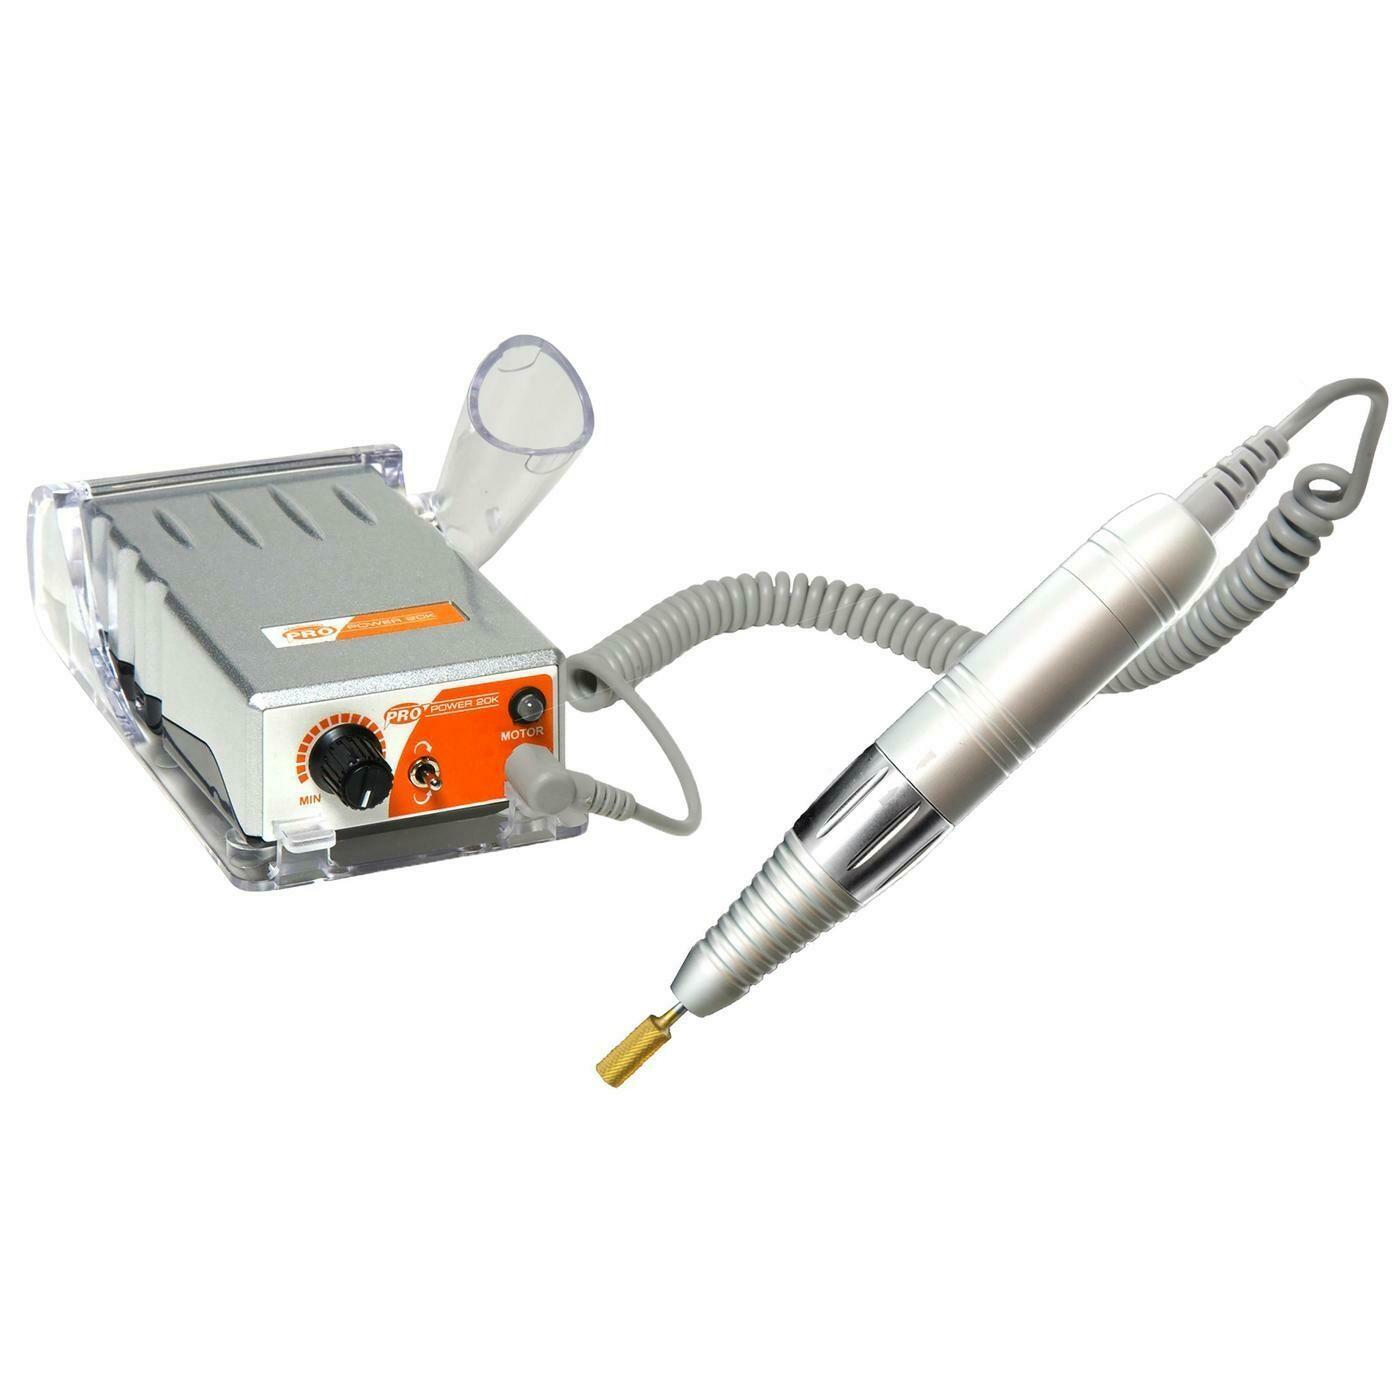 [Medicool] Pro Power® 20k Professional Electric File